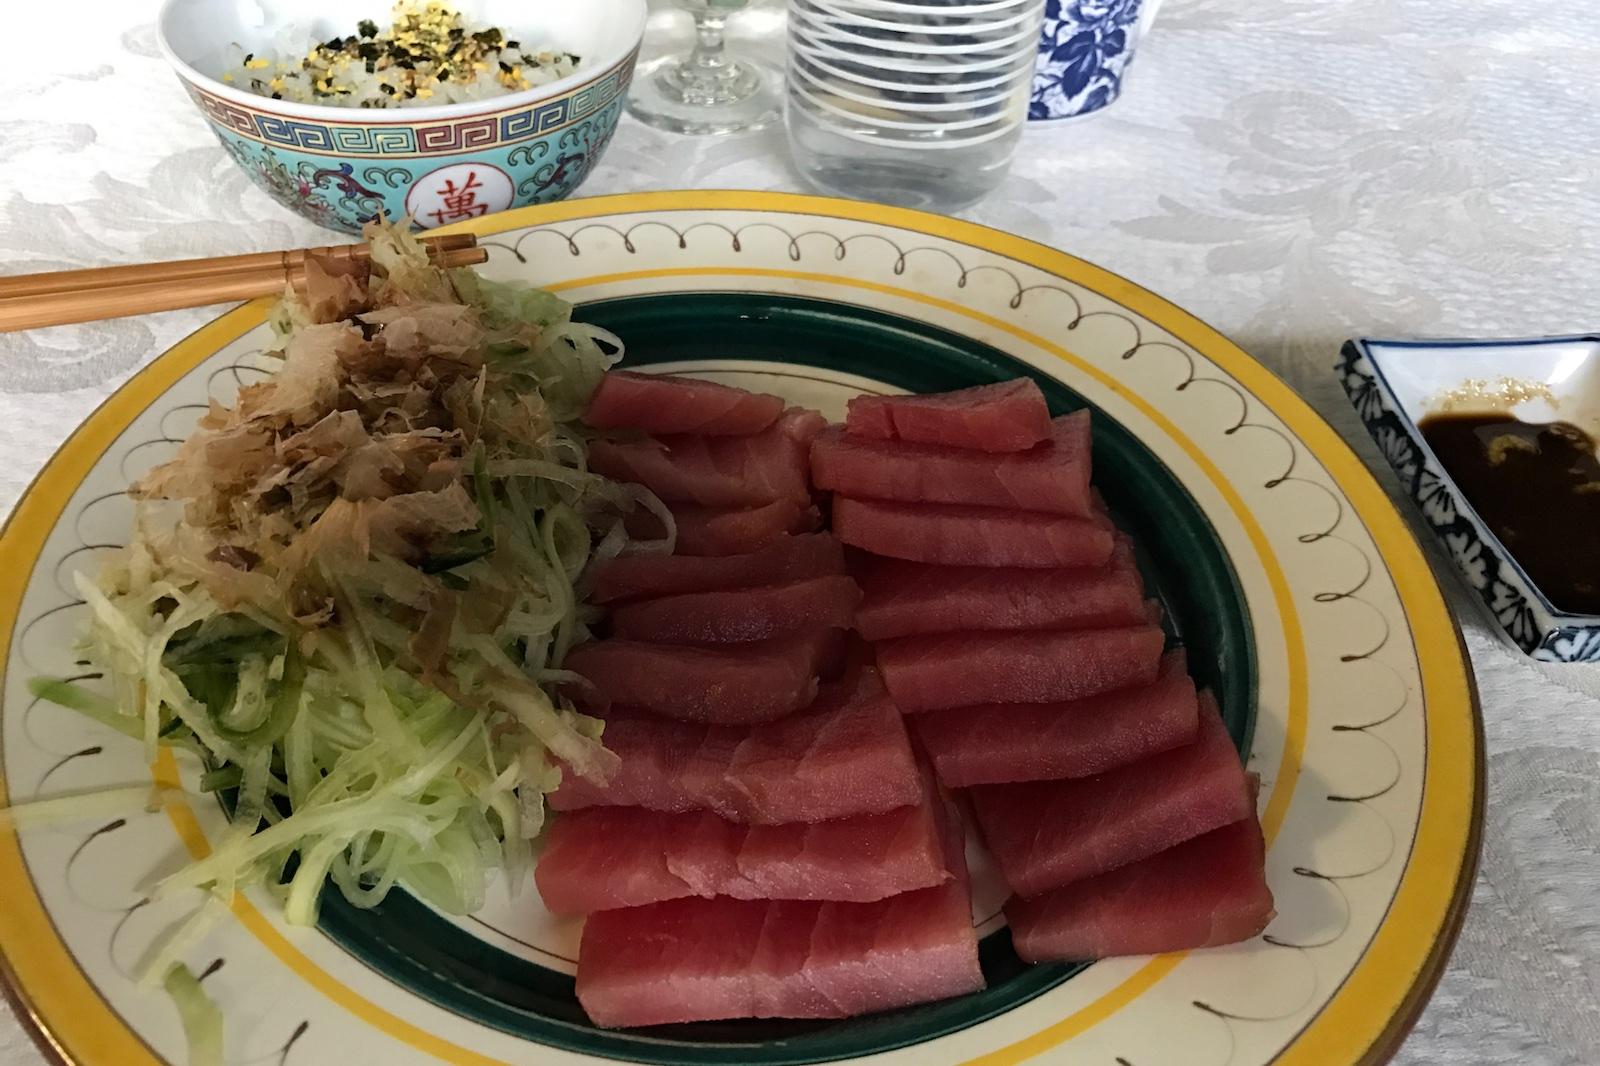 http://blog.rickk.com/food/2016/11/26/ate.2016.11.25.l.jpg